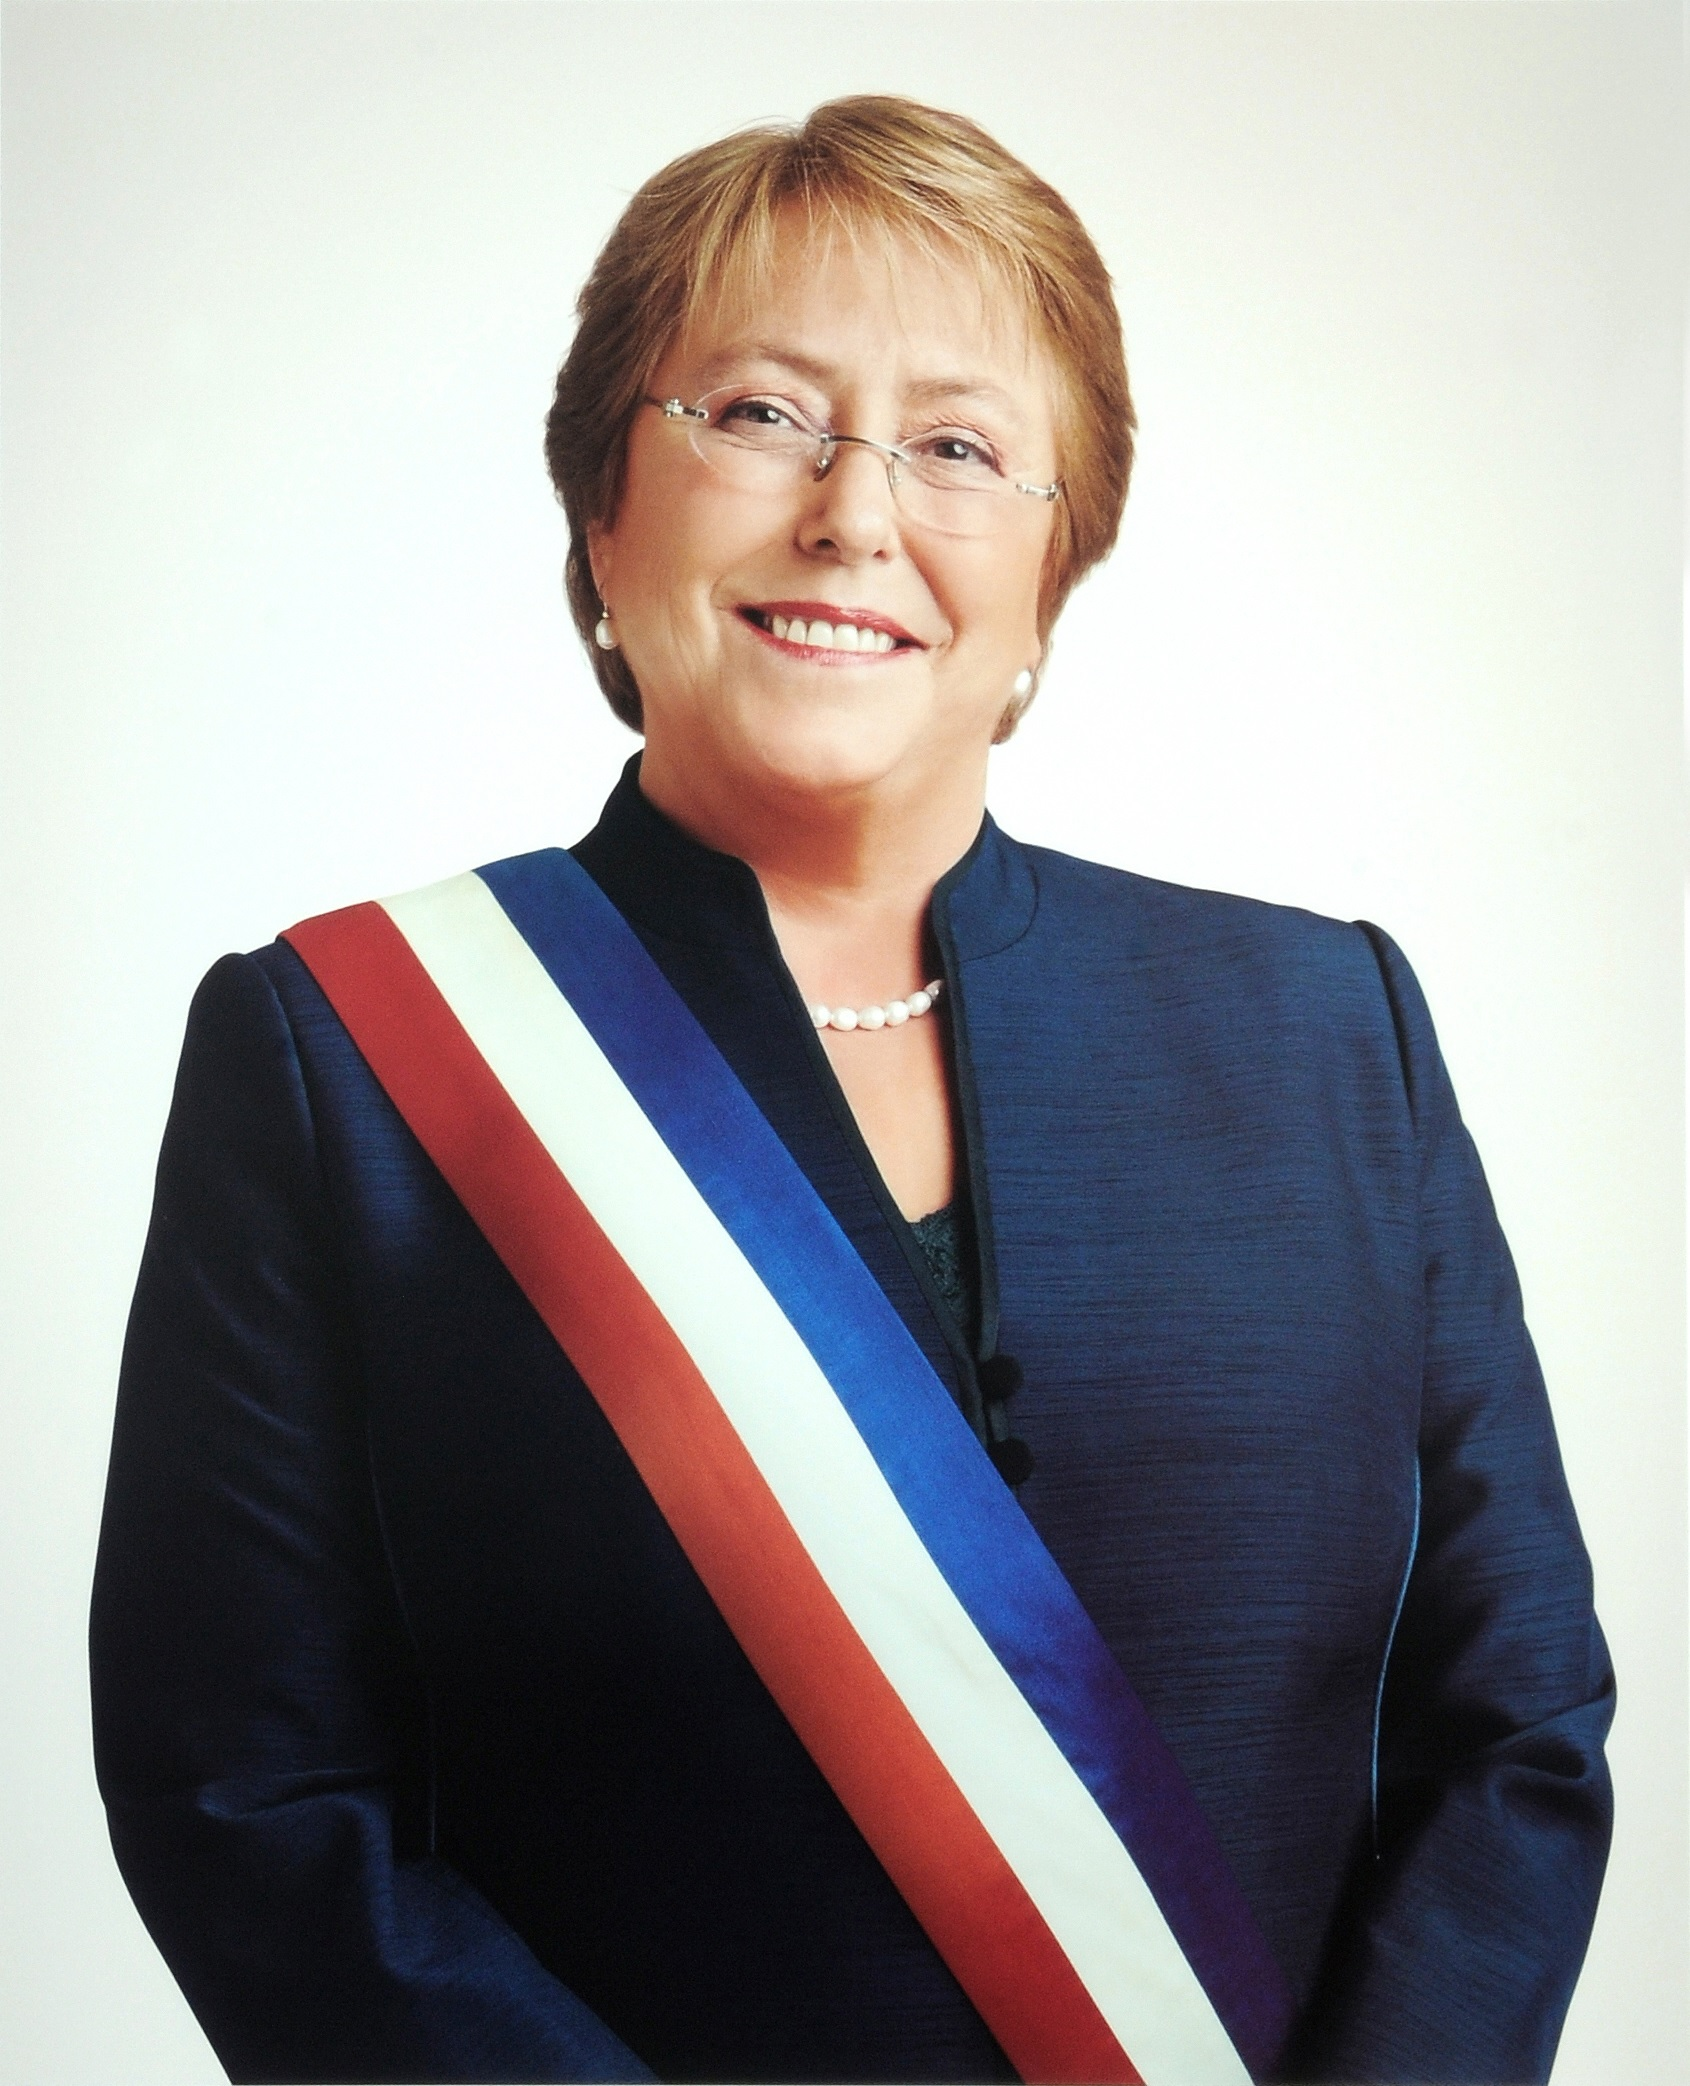 Foto Presidenta Bachelet-2.jpg